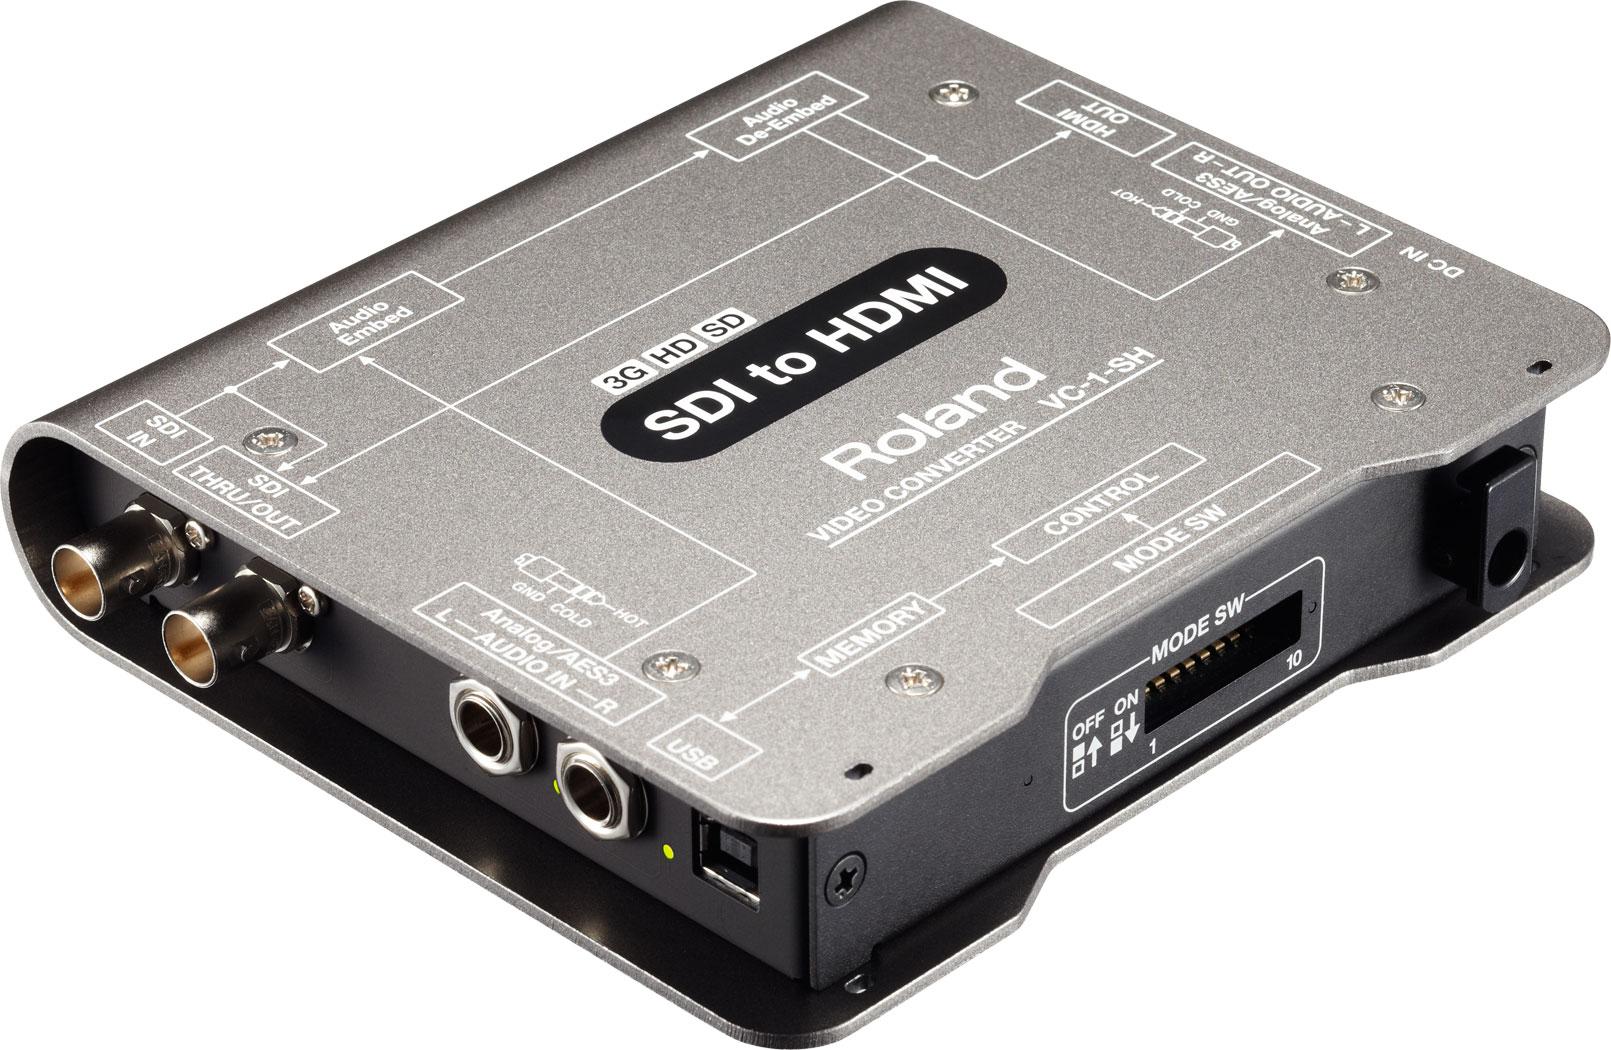 Roland 3G-SDI to HDMI Video Converter